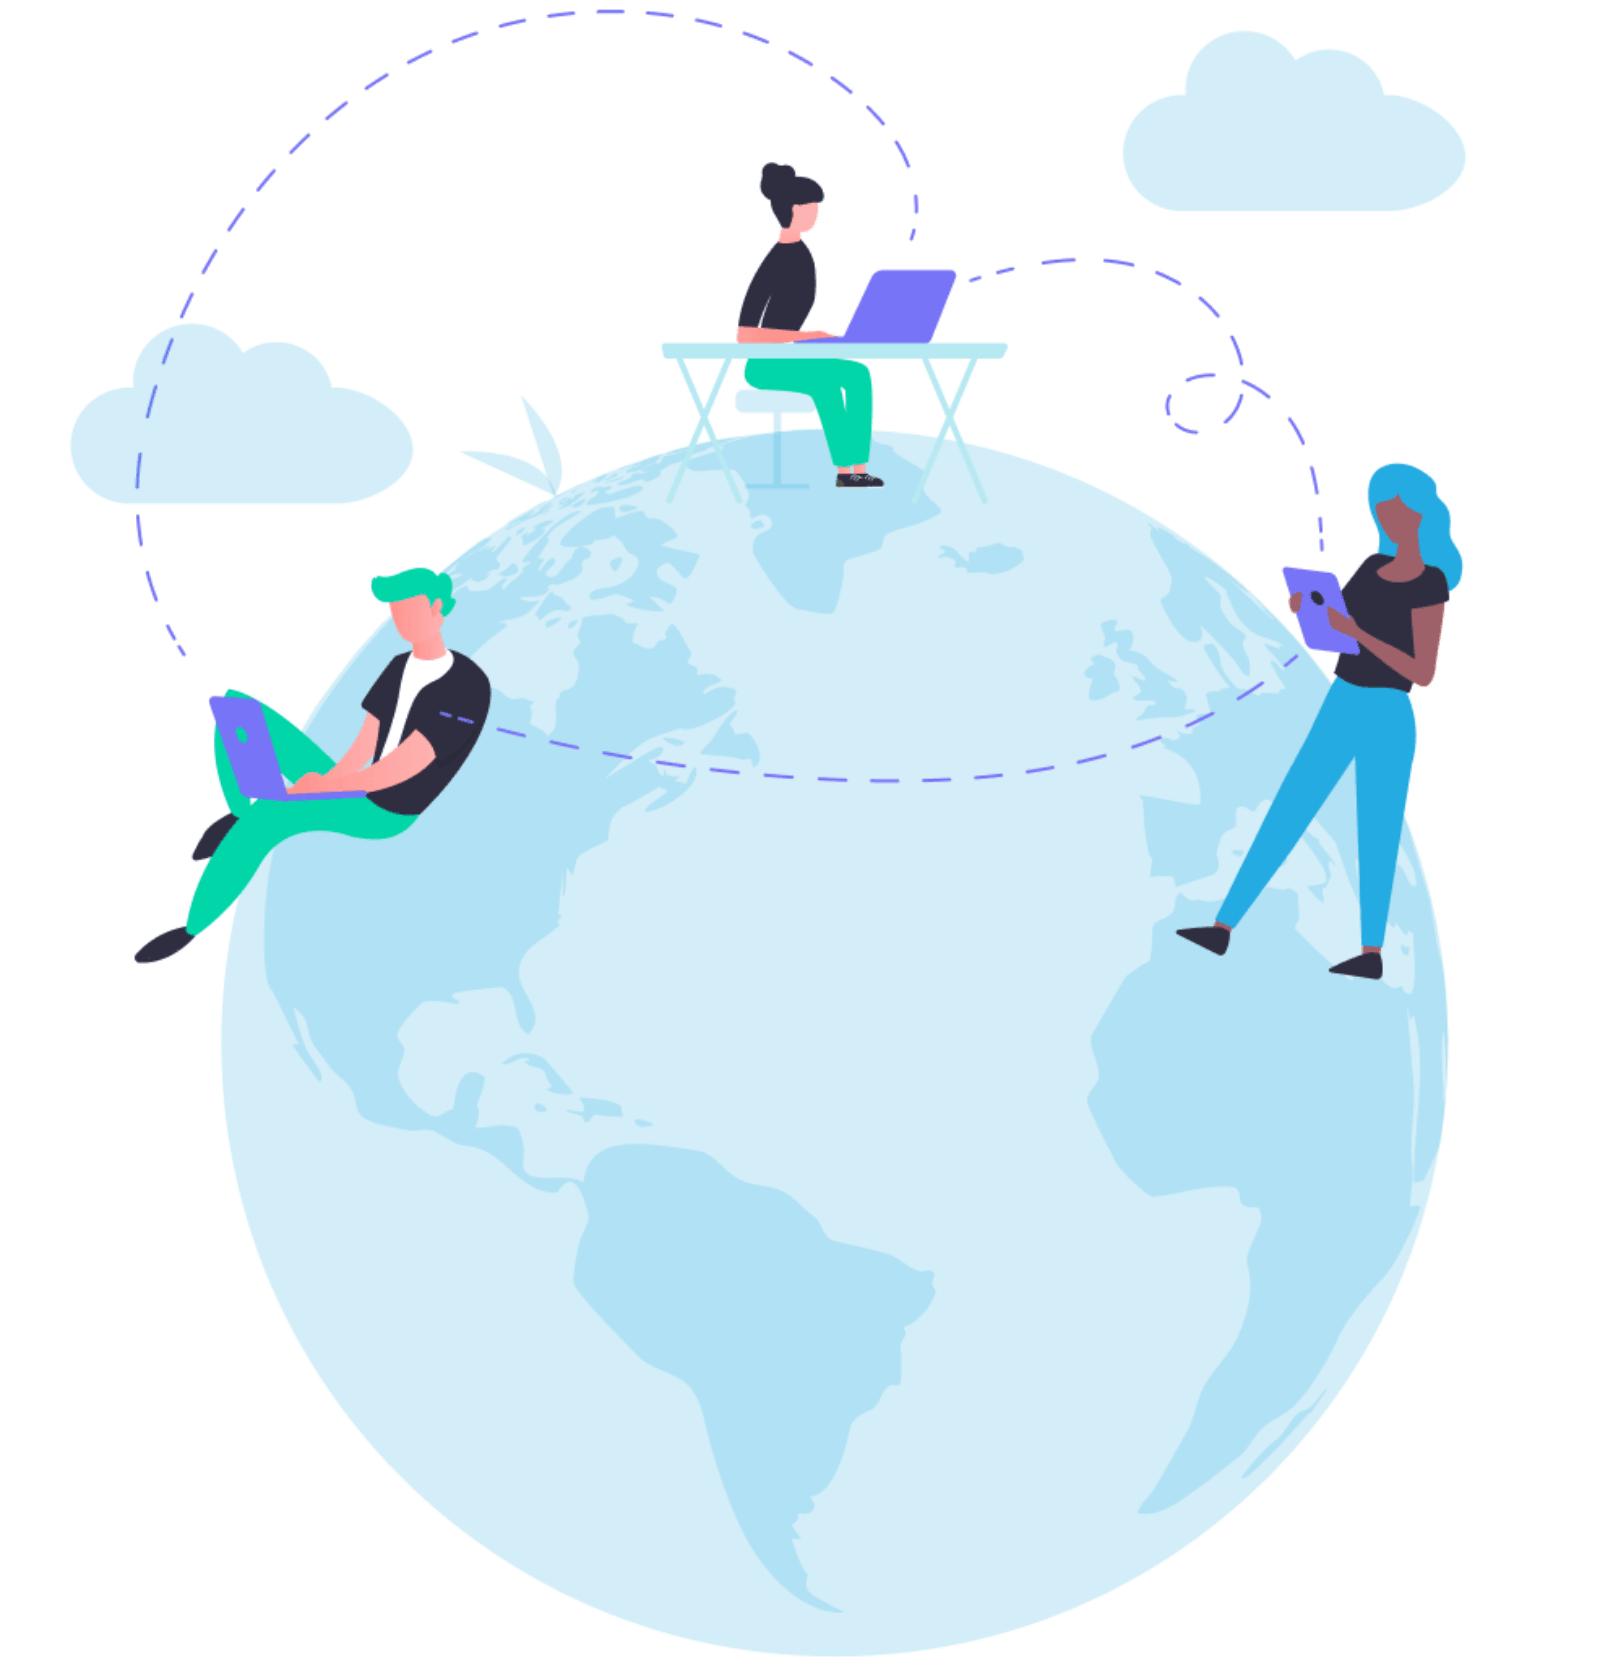 Language lab connectivity